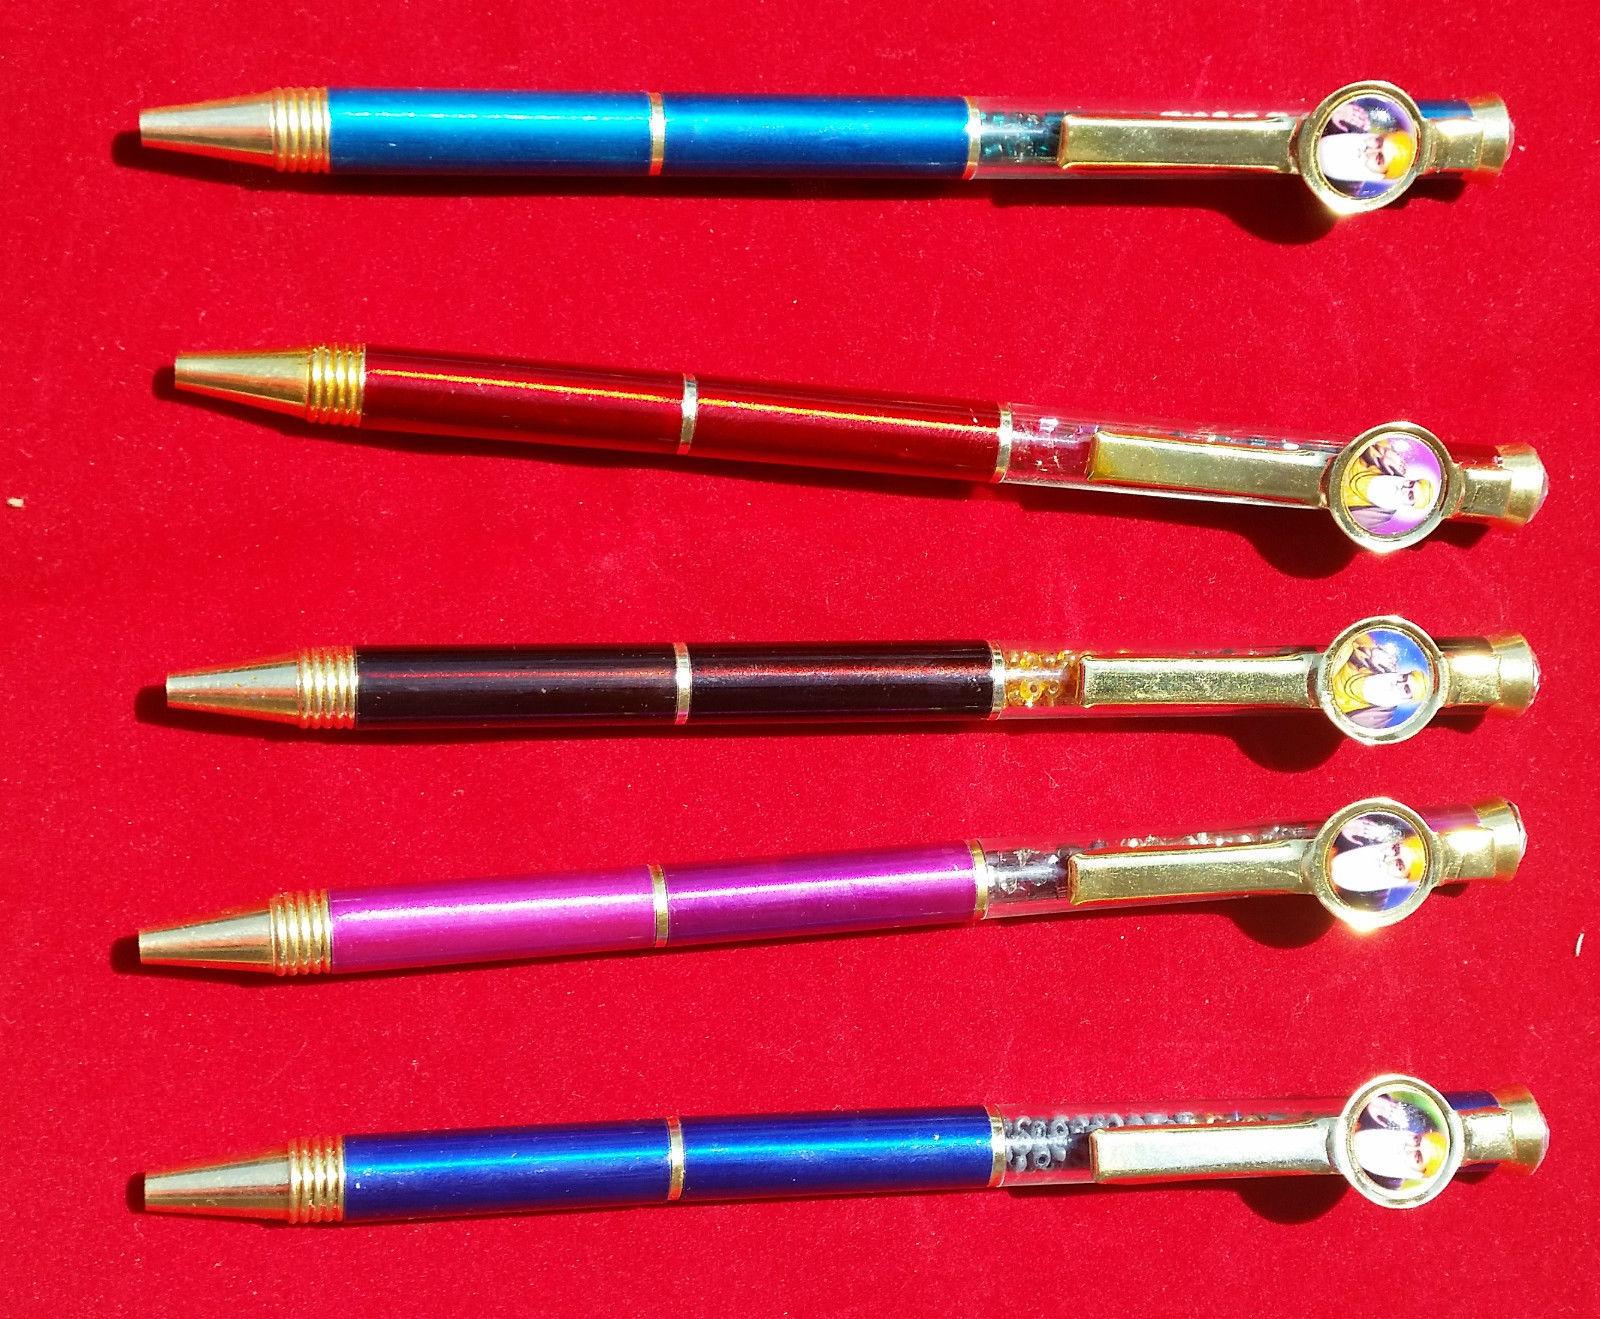 Punjabi Hindu Sikh Khalsa Guru Nanak Photo Ball Pen set - 10 Pens Premium Gift